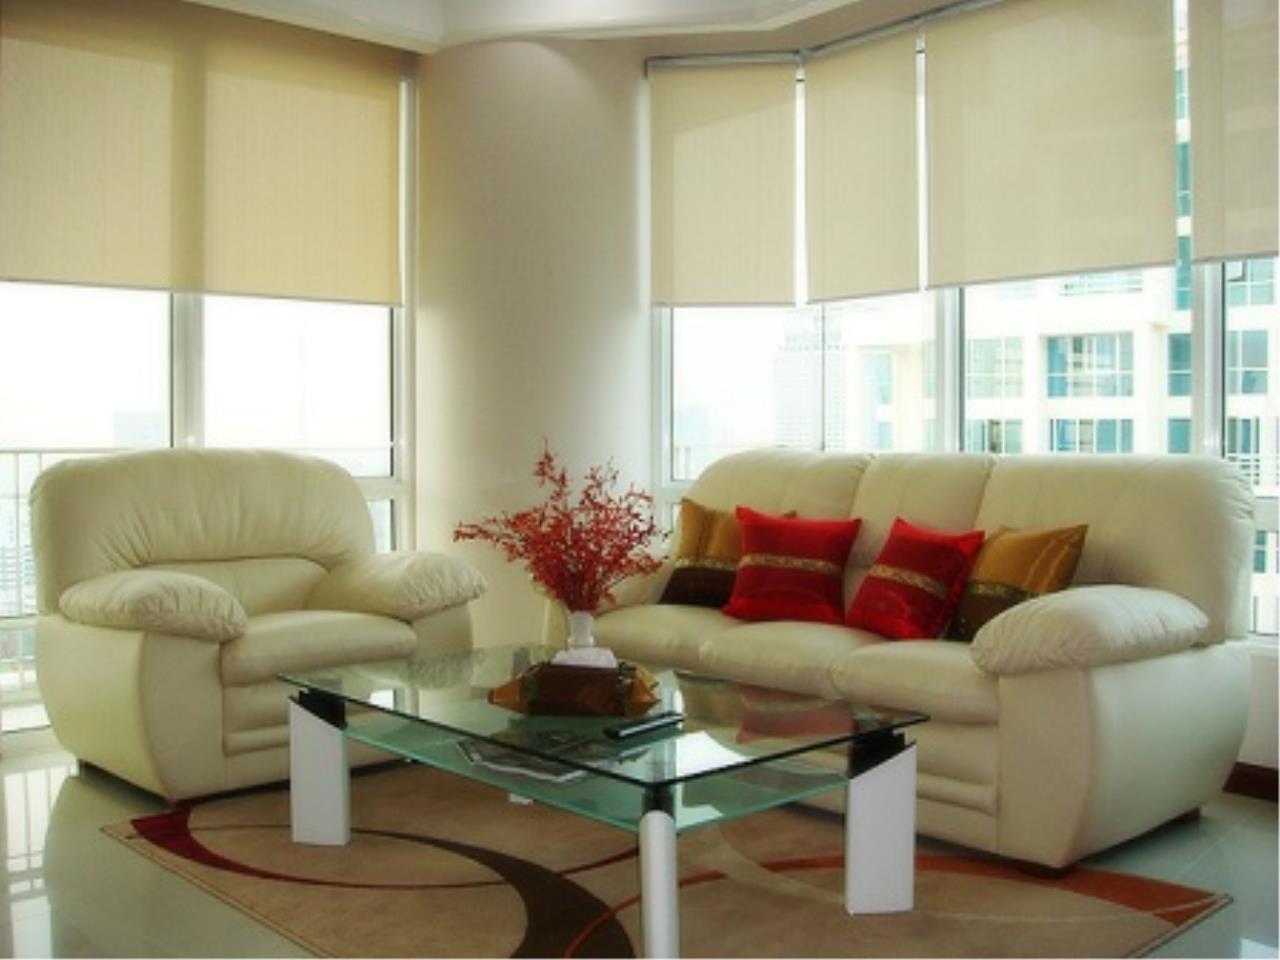 Right Move Thailand Agency's CS1947 Anatara Baan Rajprasong 2 Bedrooms For Sale 13,900,000 THB 2